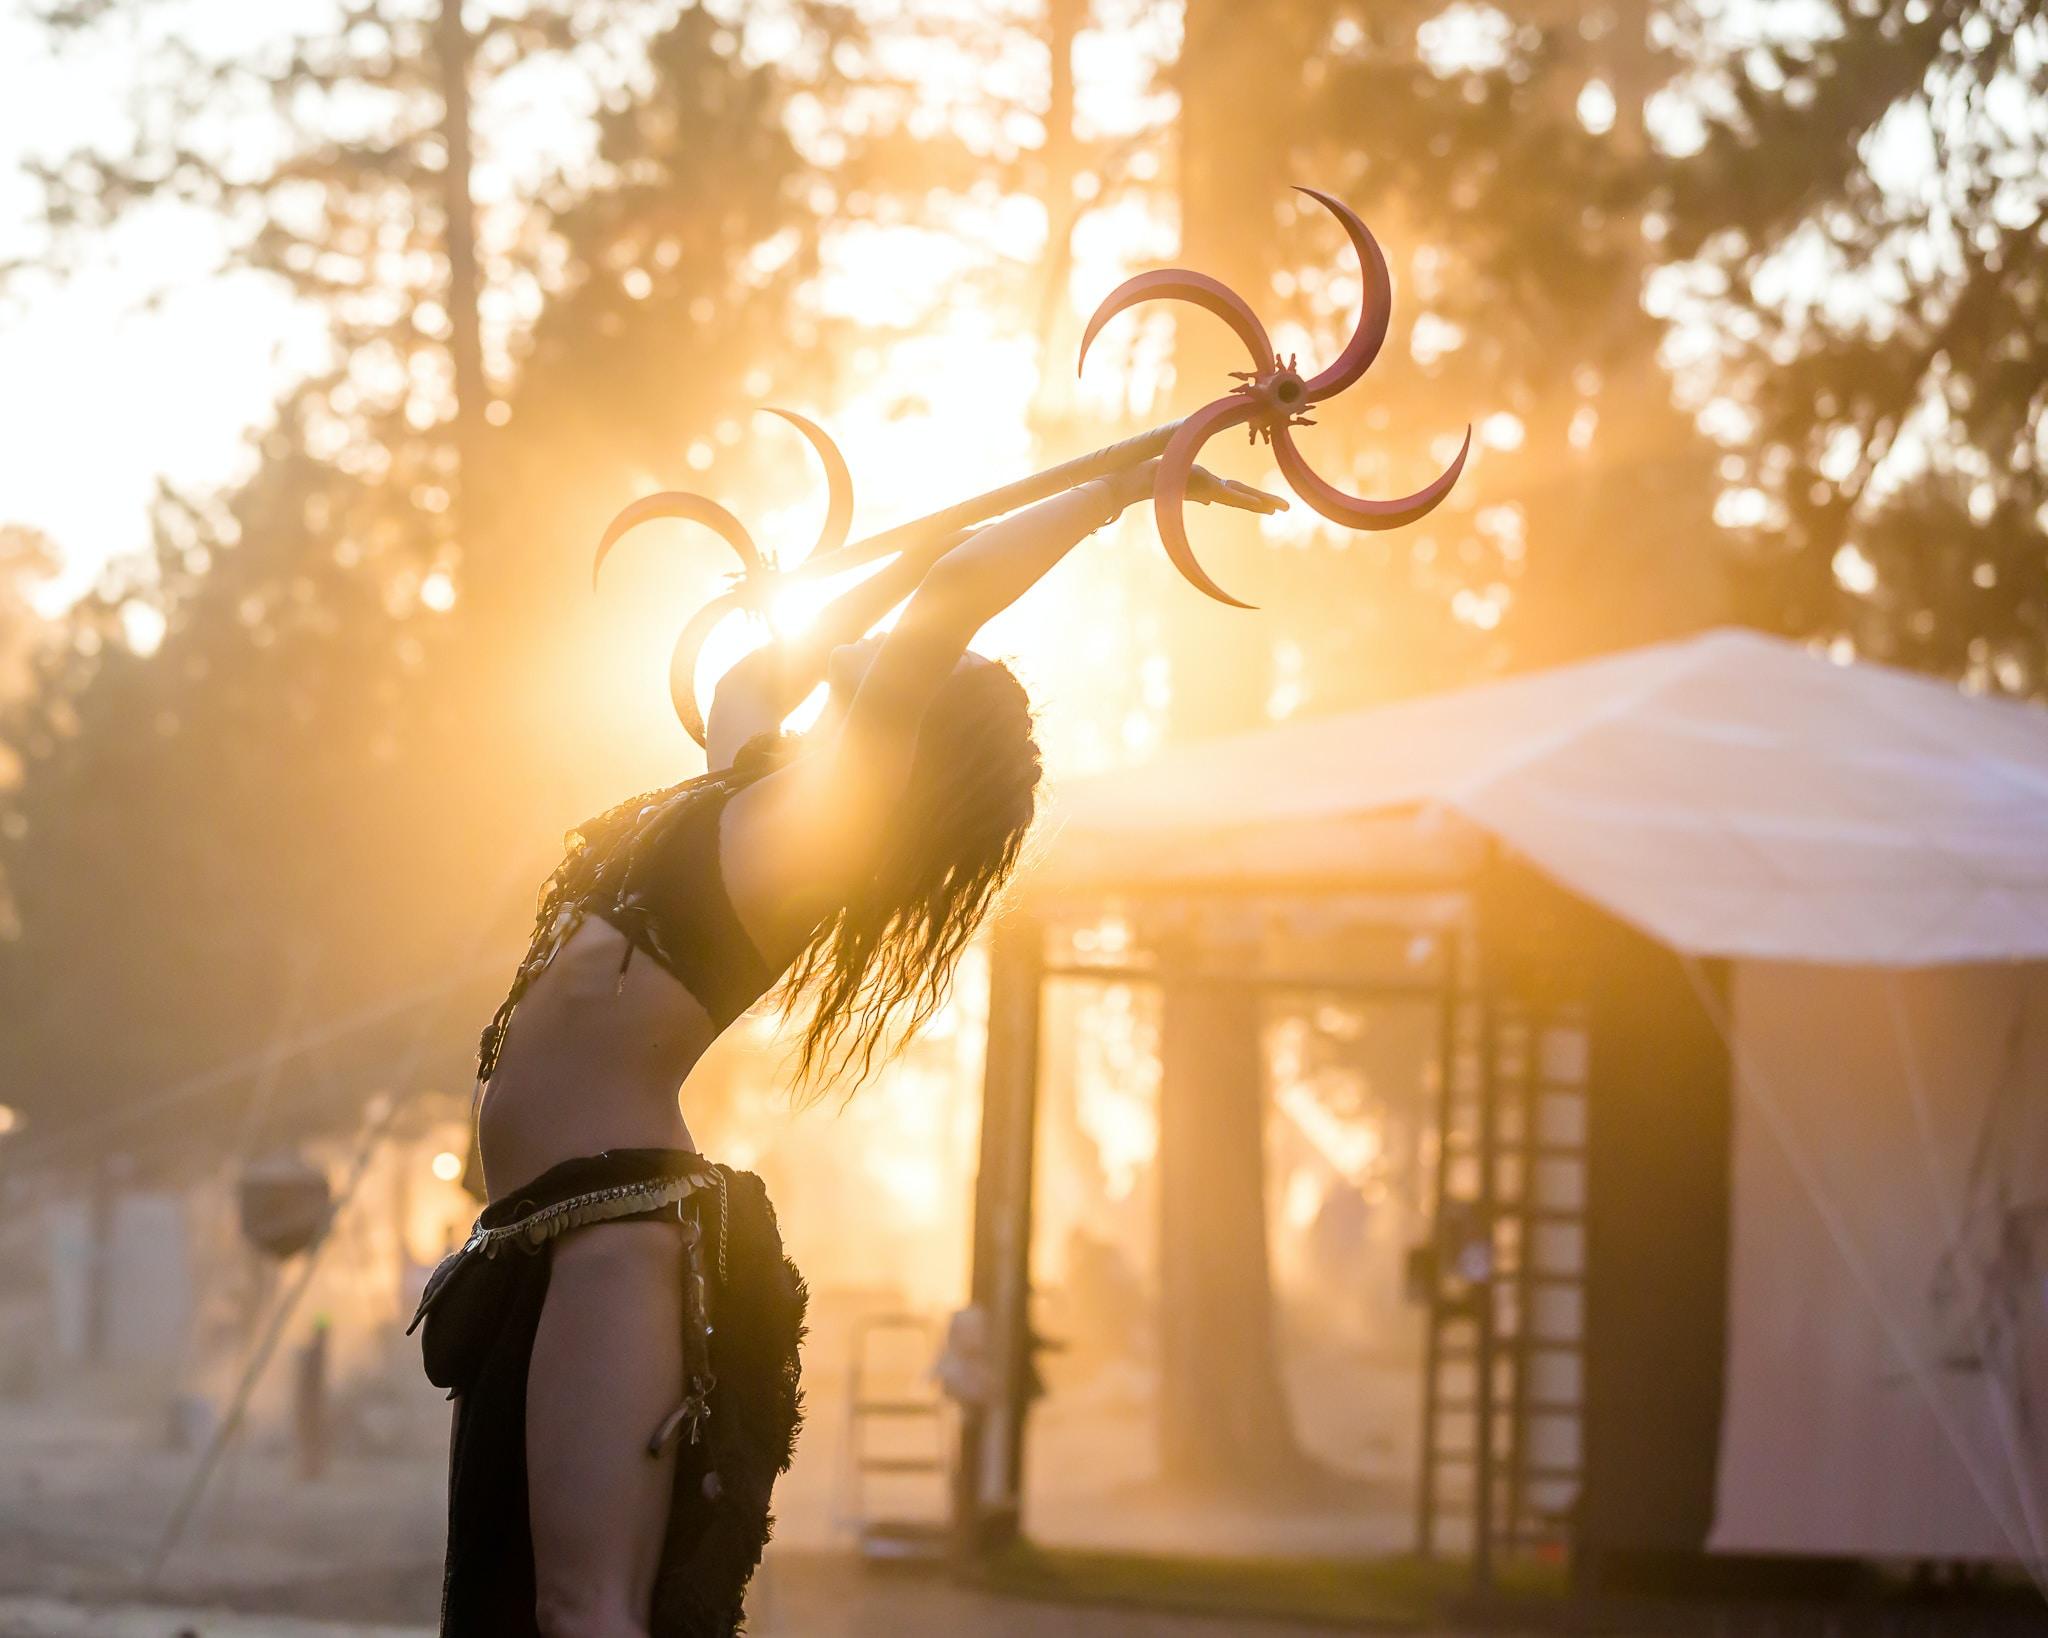 woman lifting metal bar near white tent